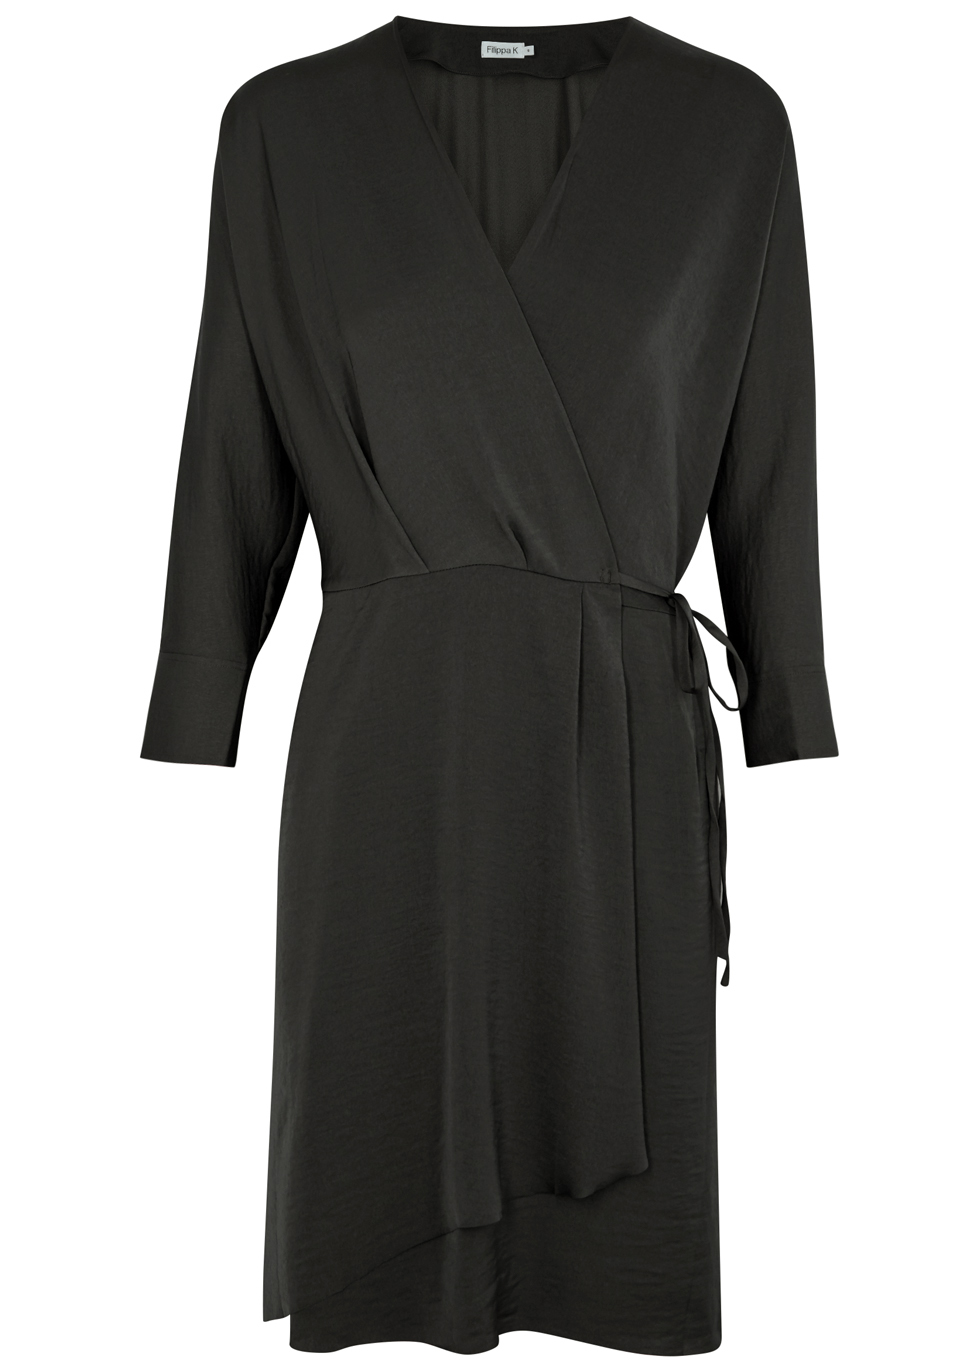 FILIPPA K ANTHRACITE SATIN WRAP DRESS